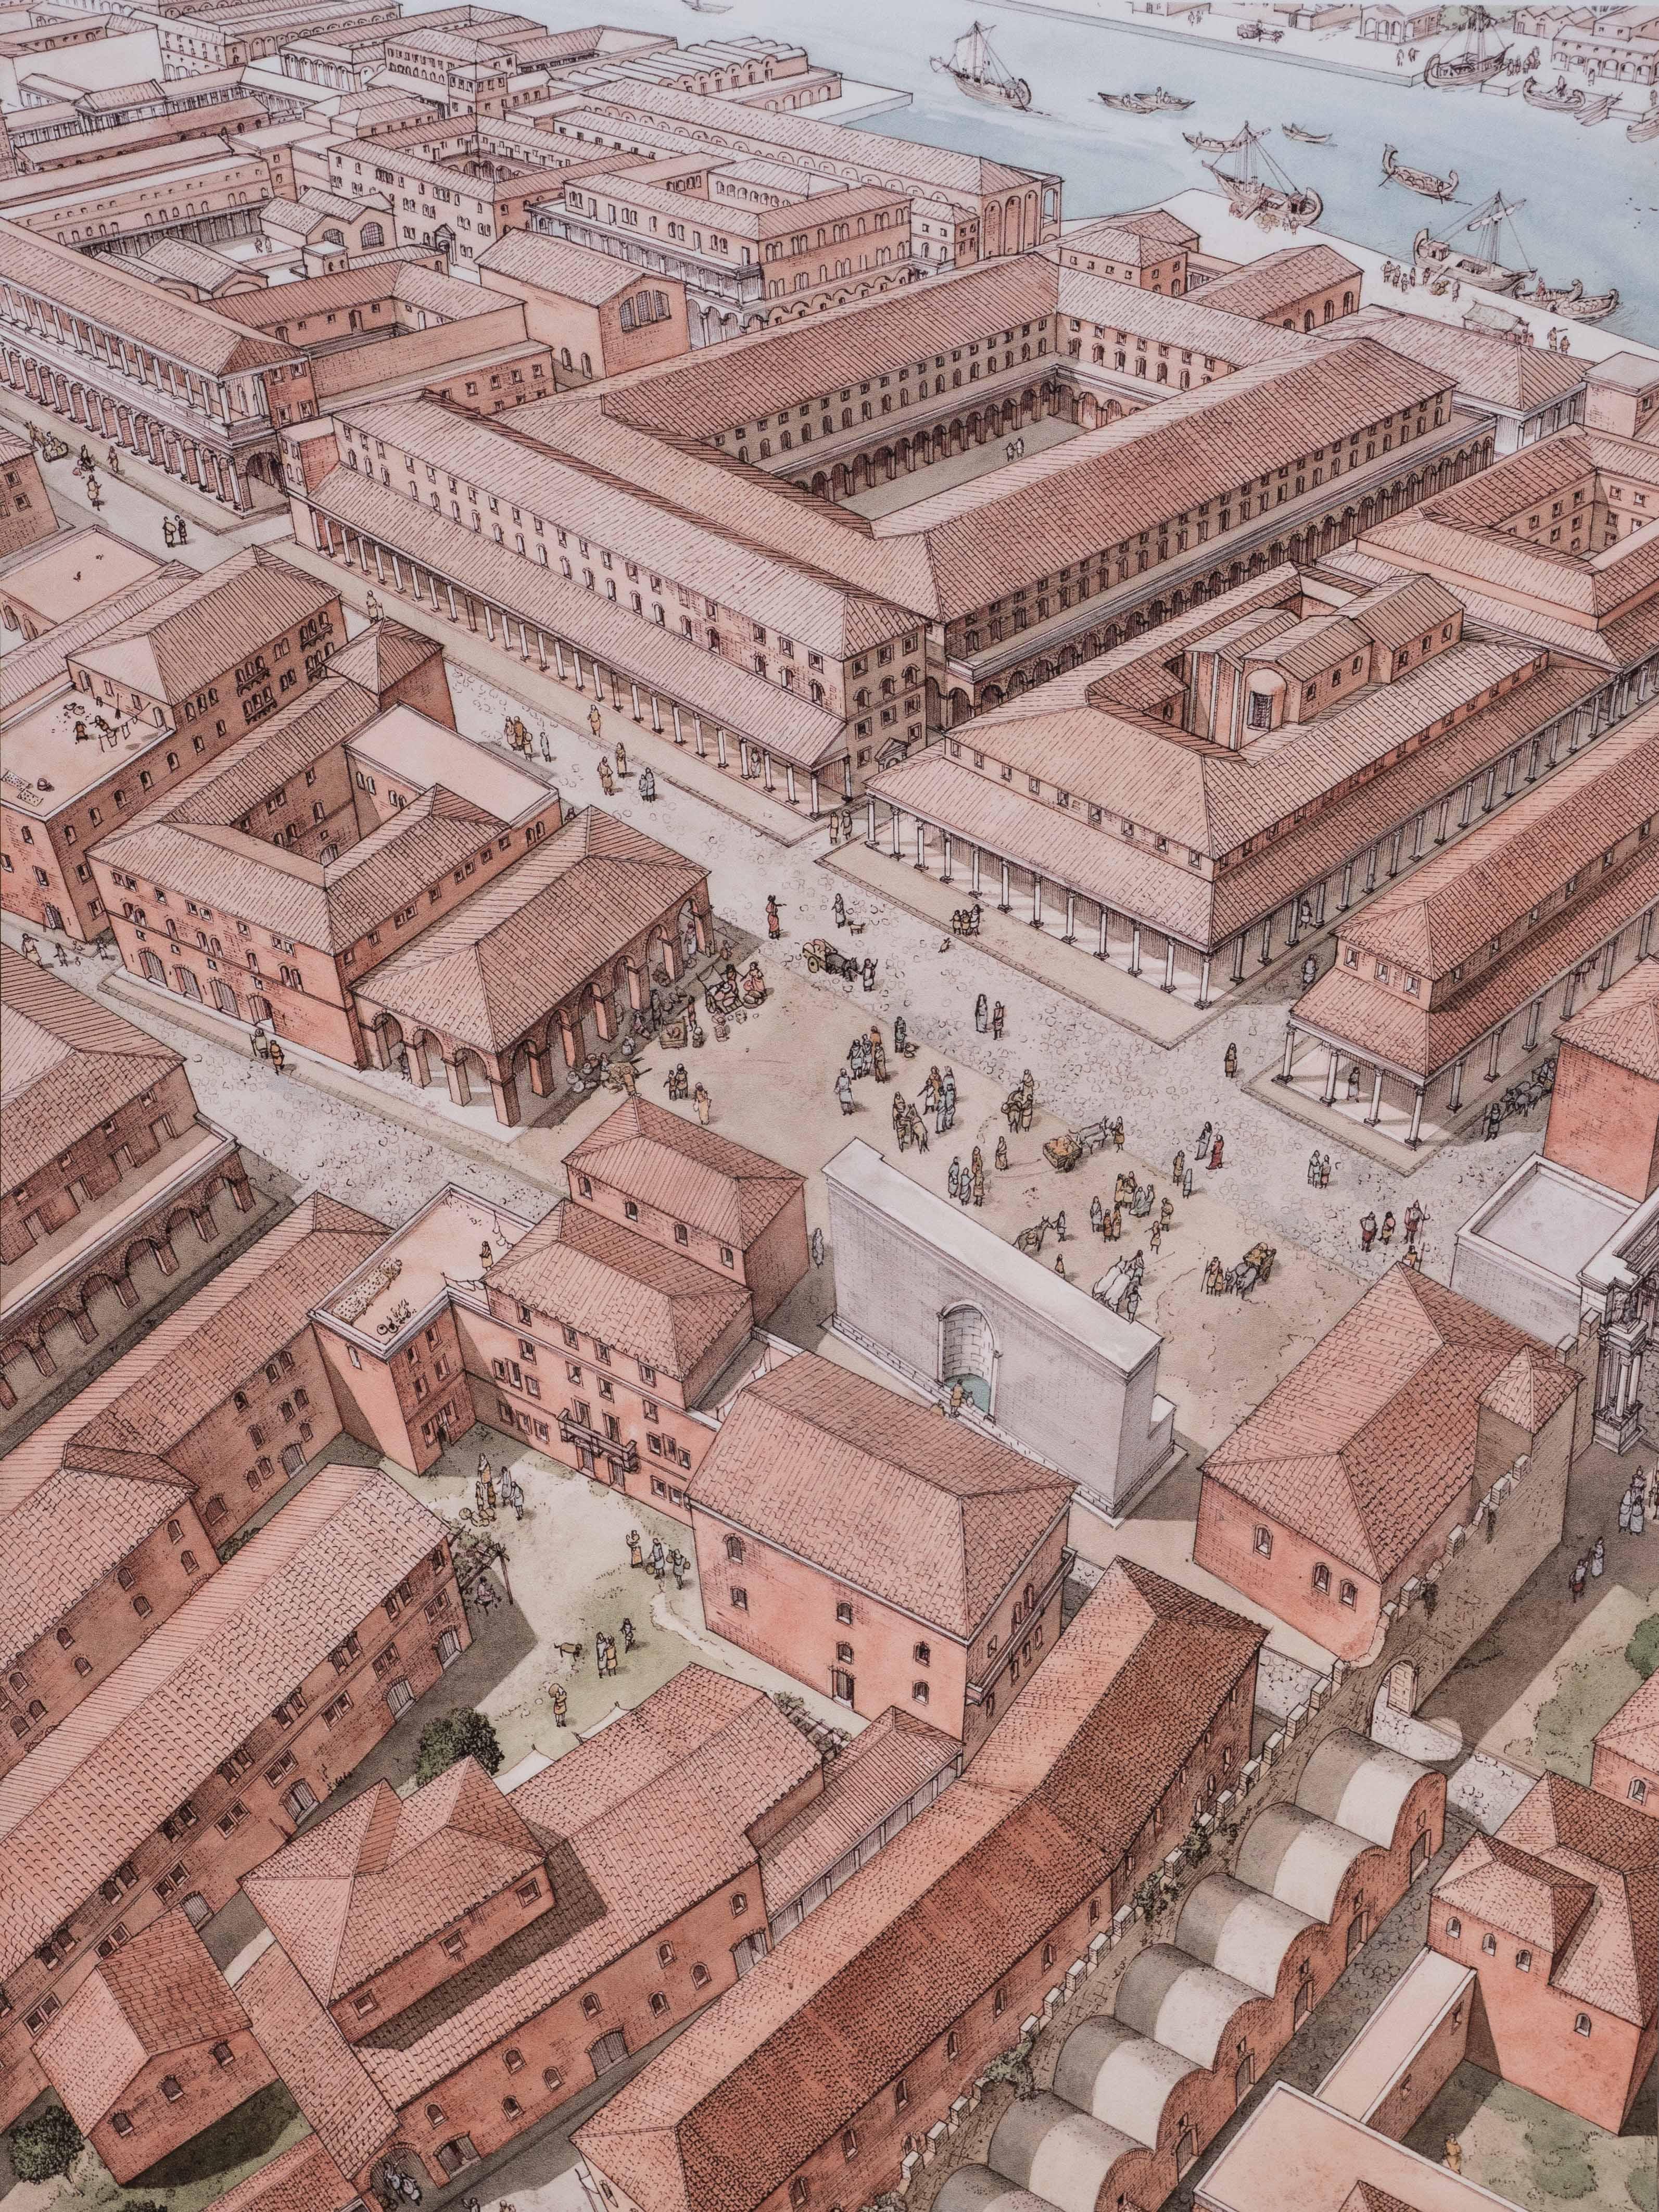 Artist's Depiction of Ostia Antica